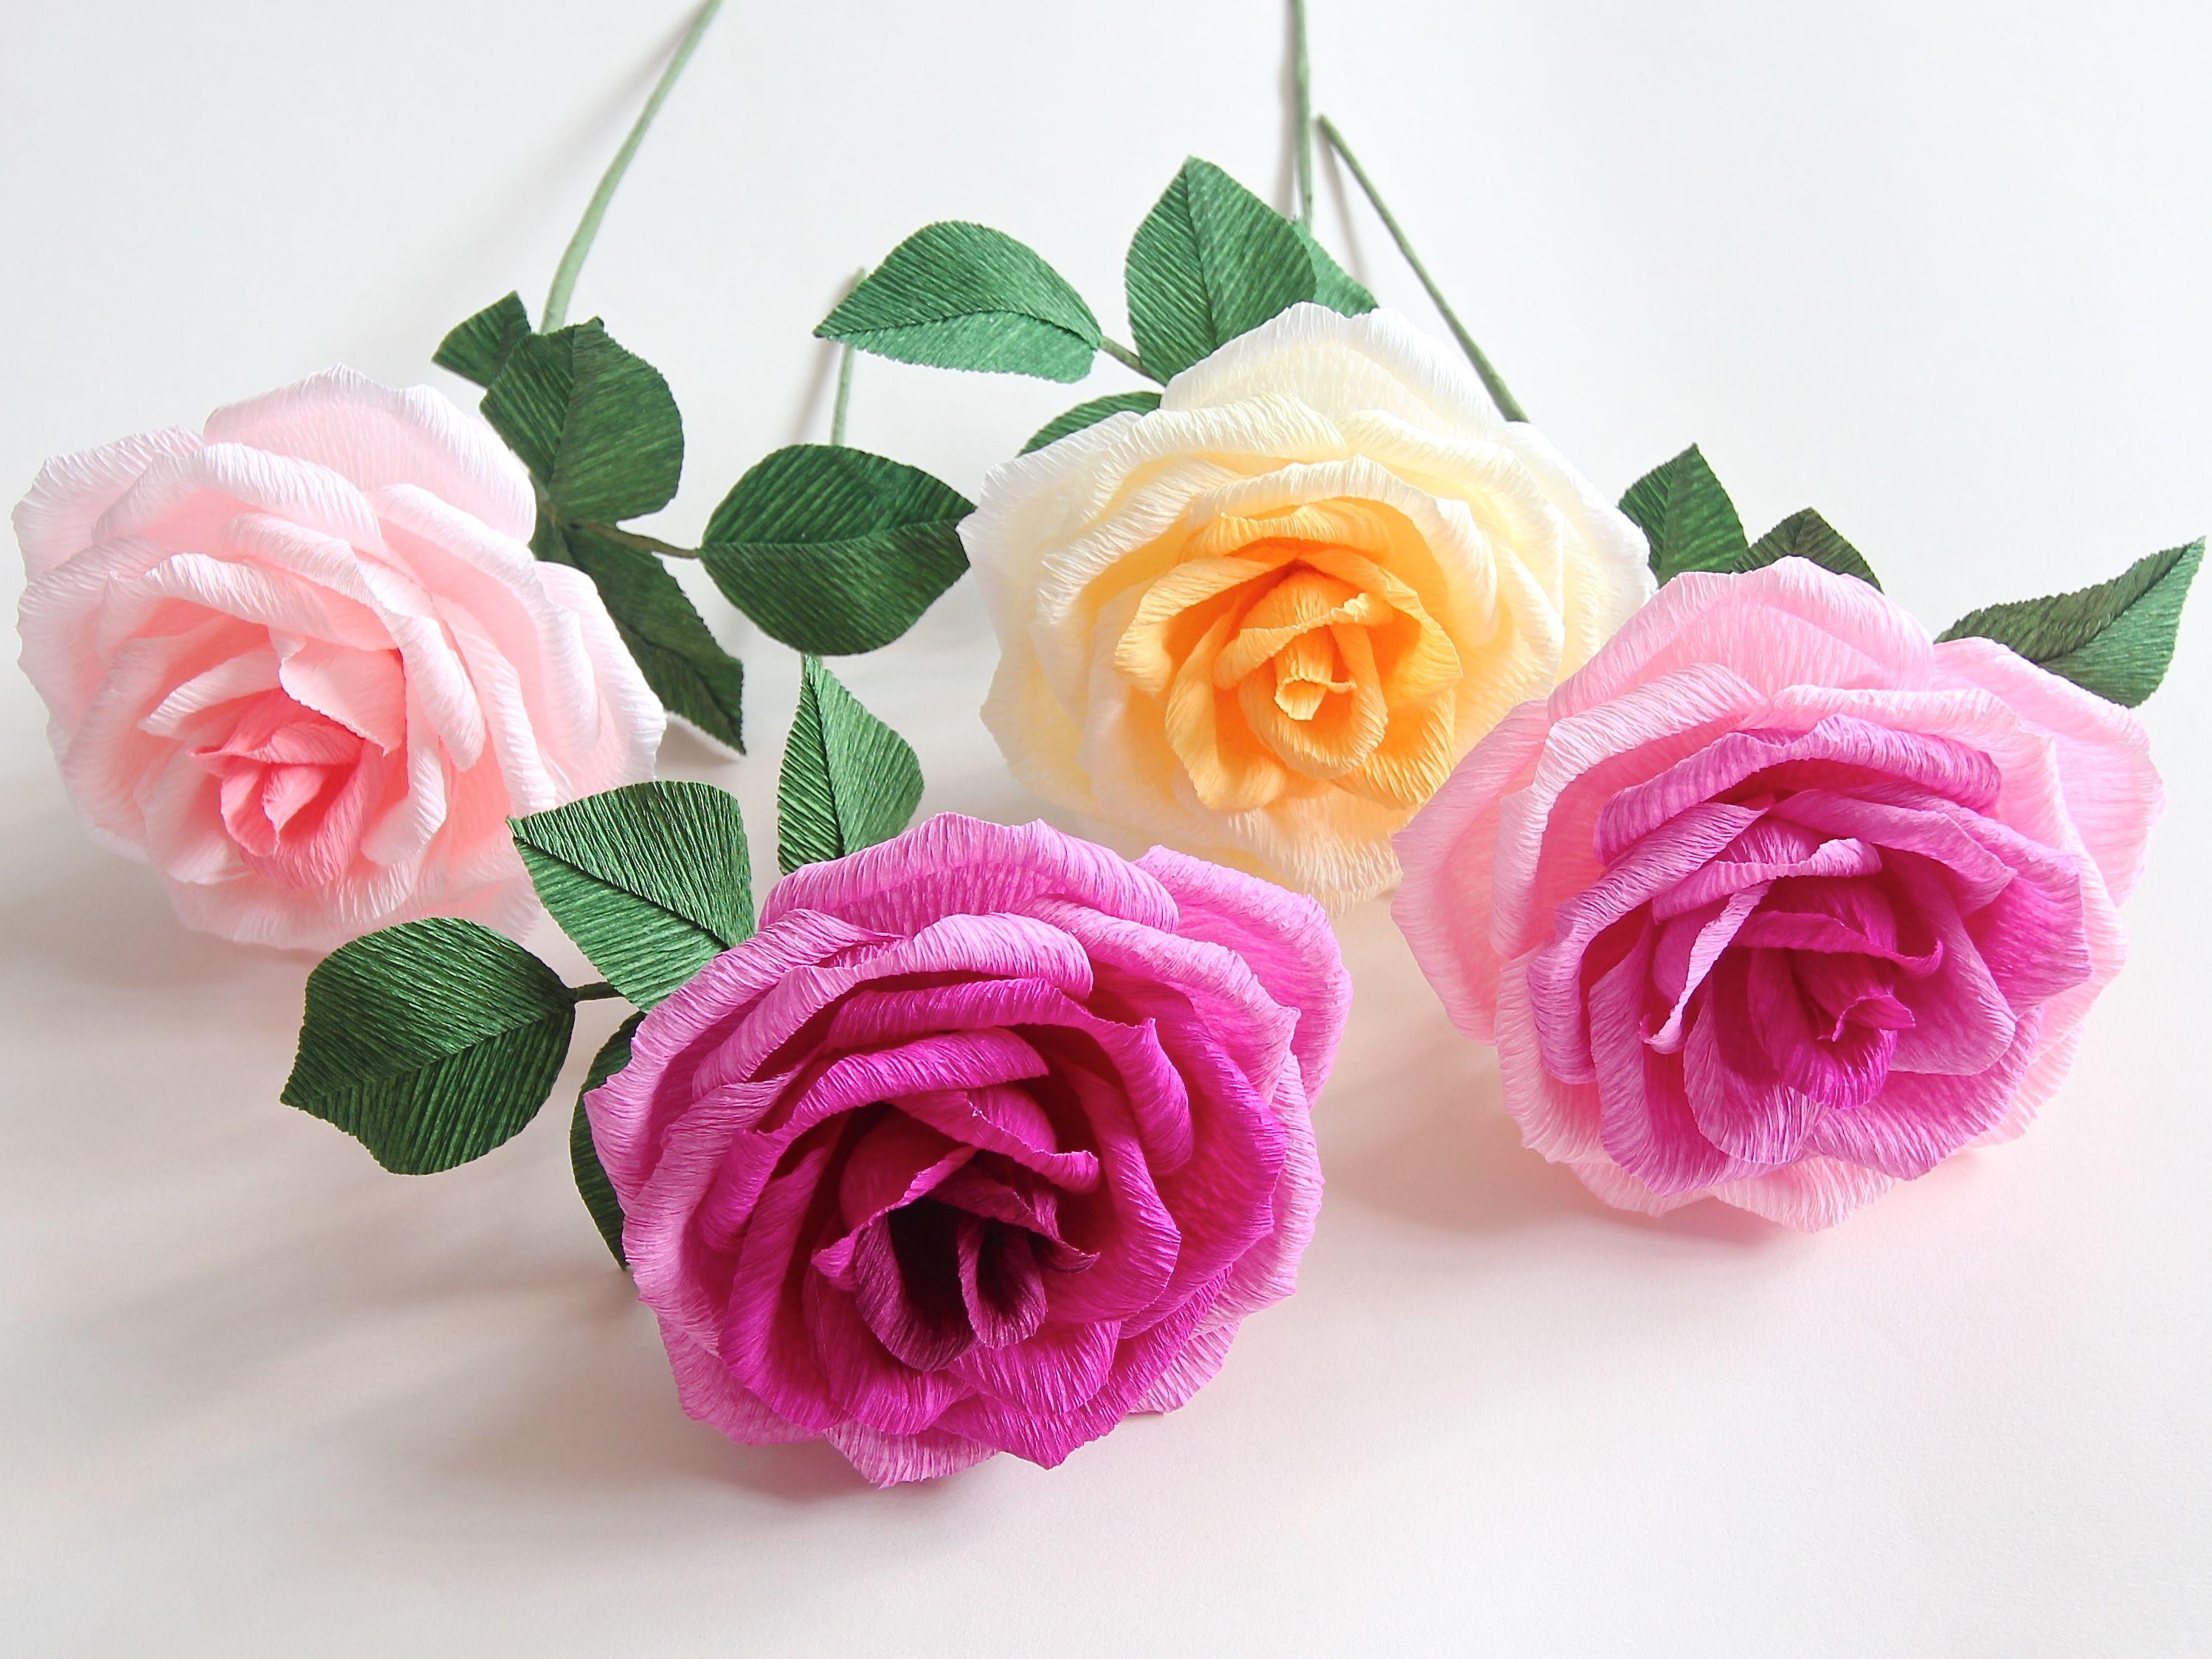 Twotoned crepe paper roses diy pinterest